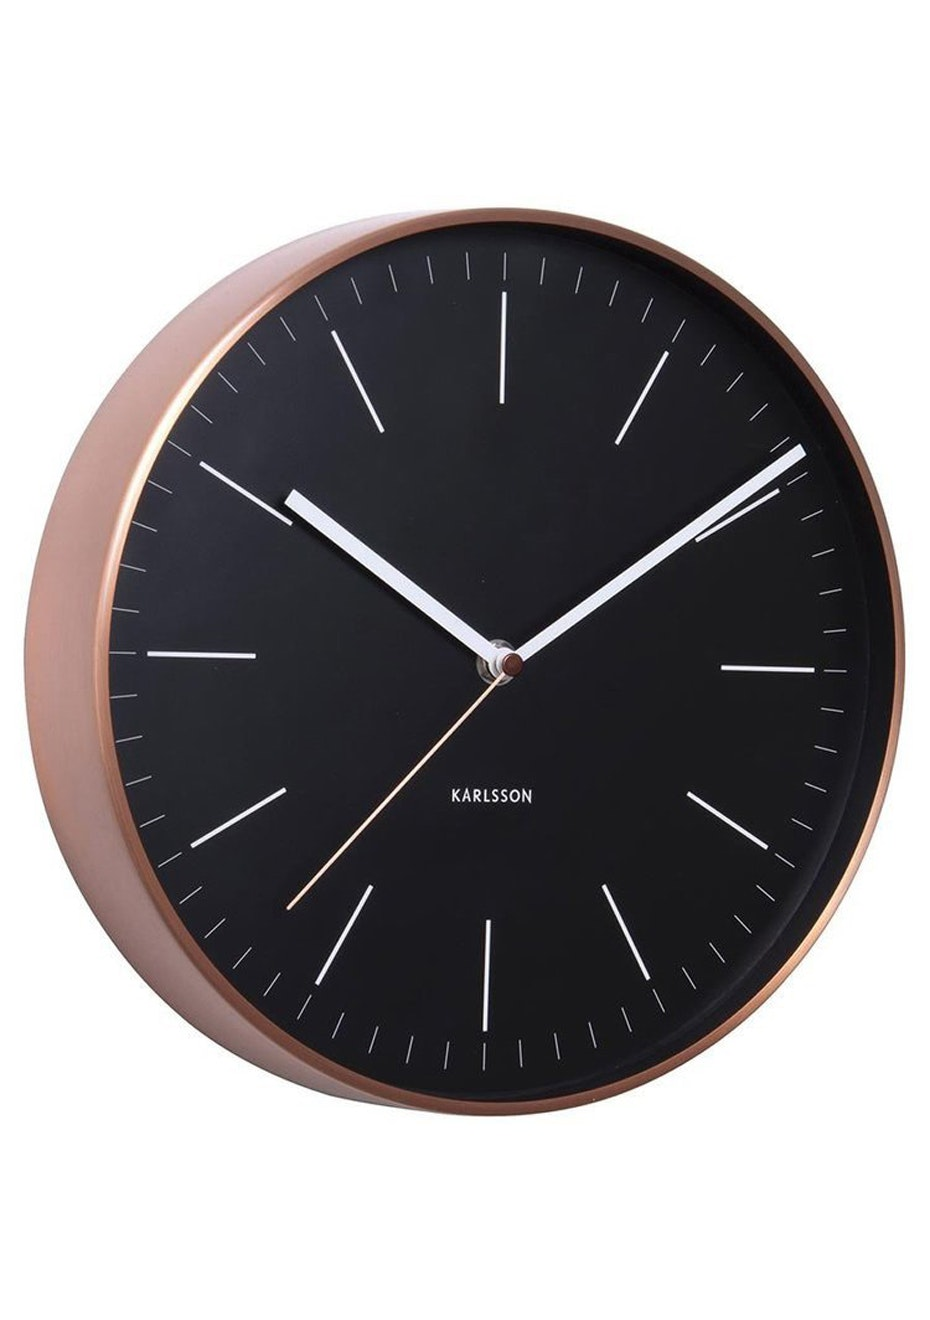 Karlsson - Wall Clock 'Minimal' - Black